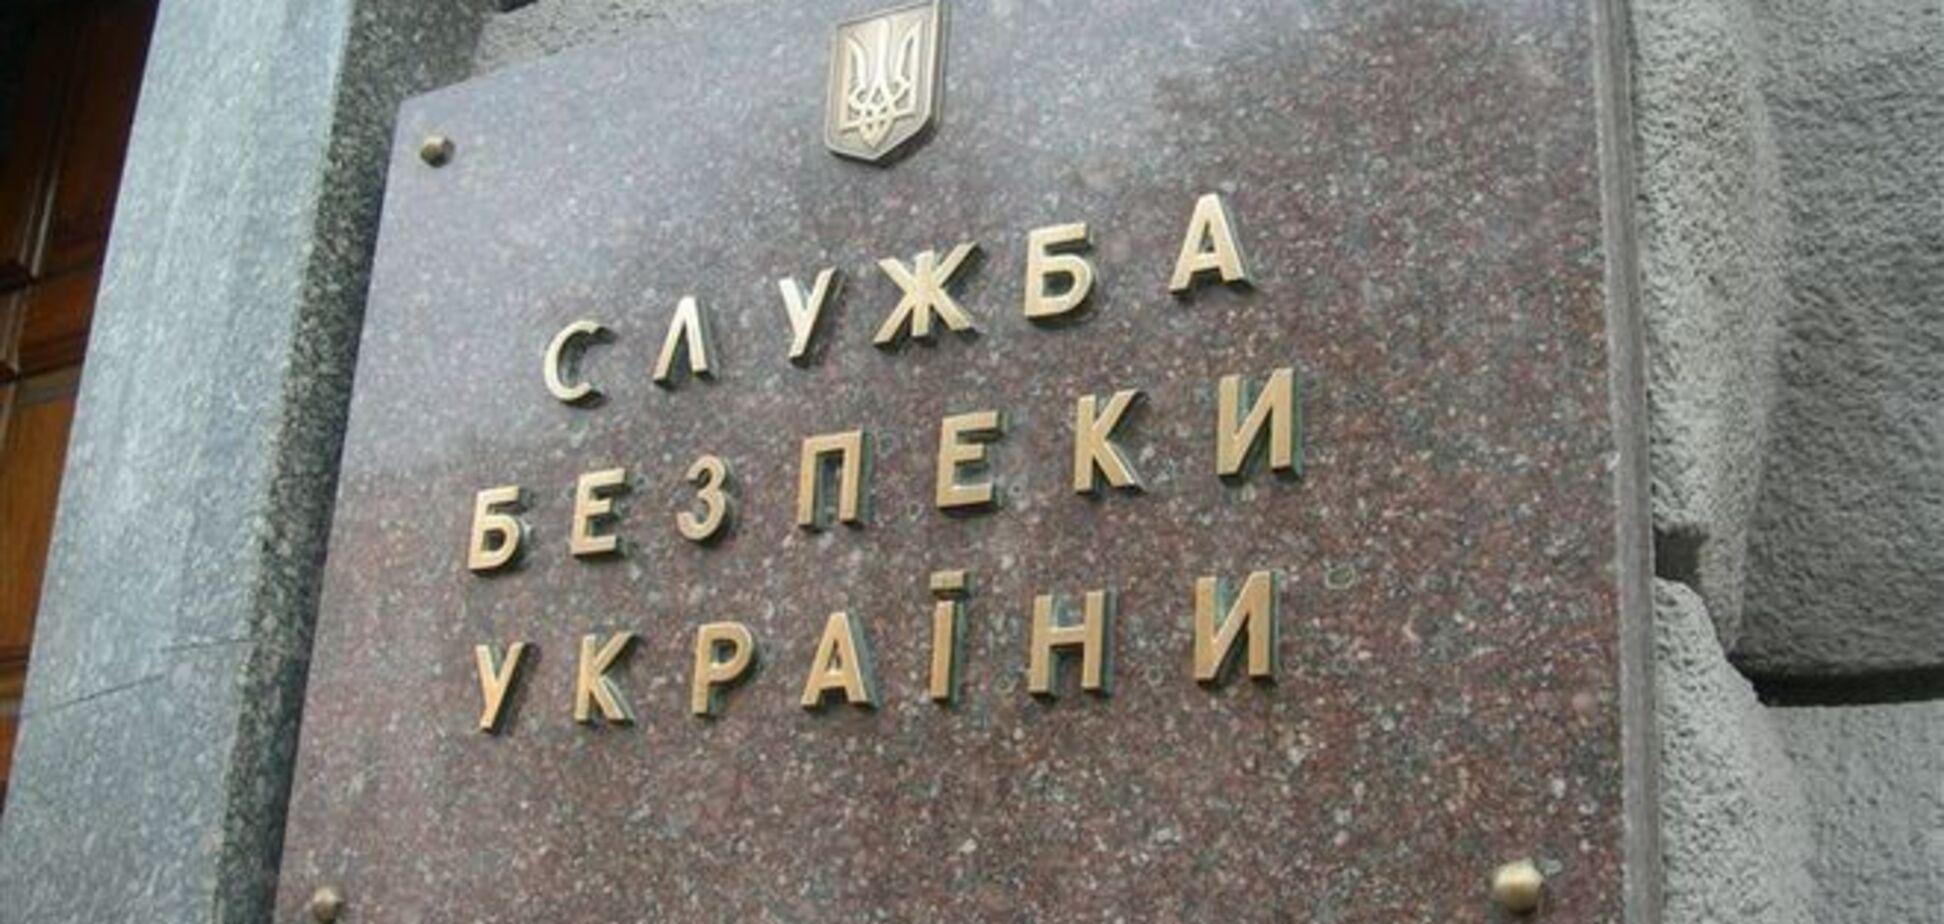 СБУ арестовала почти 900 человек за терроризм